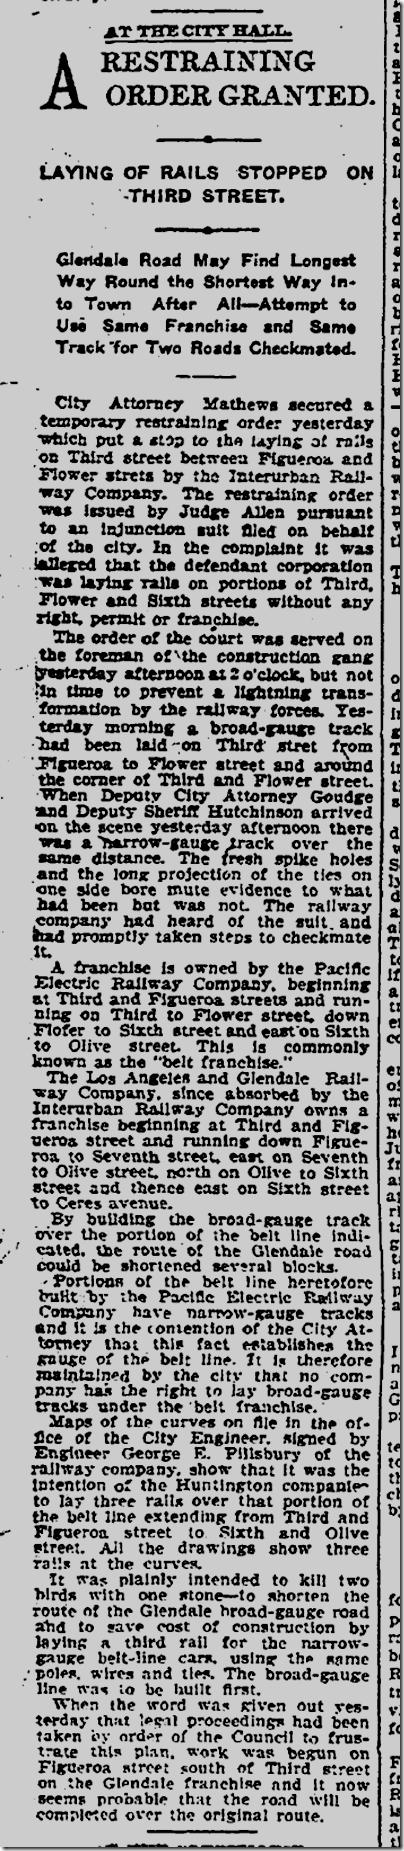 April 7, 1904, Streetcars